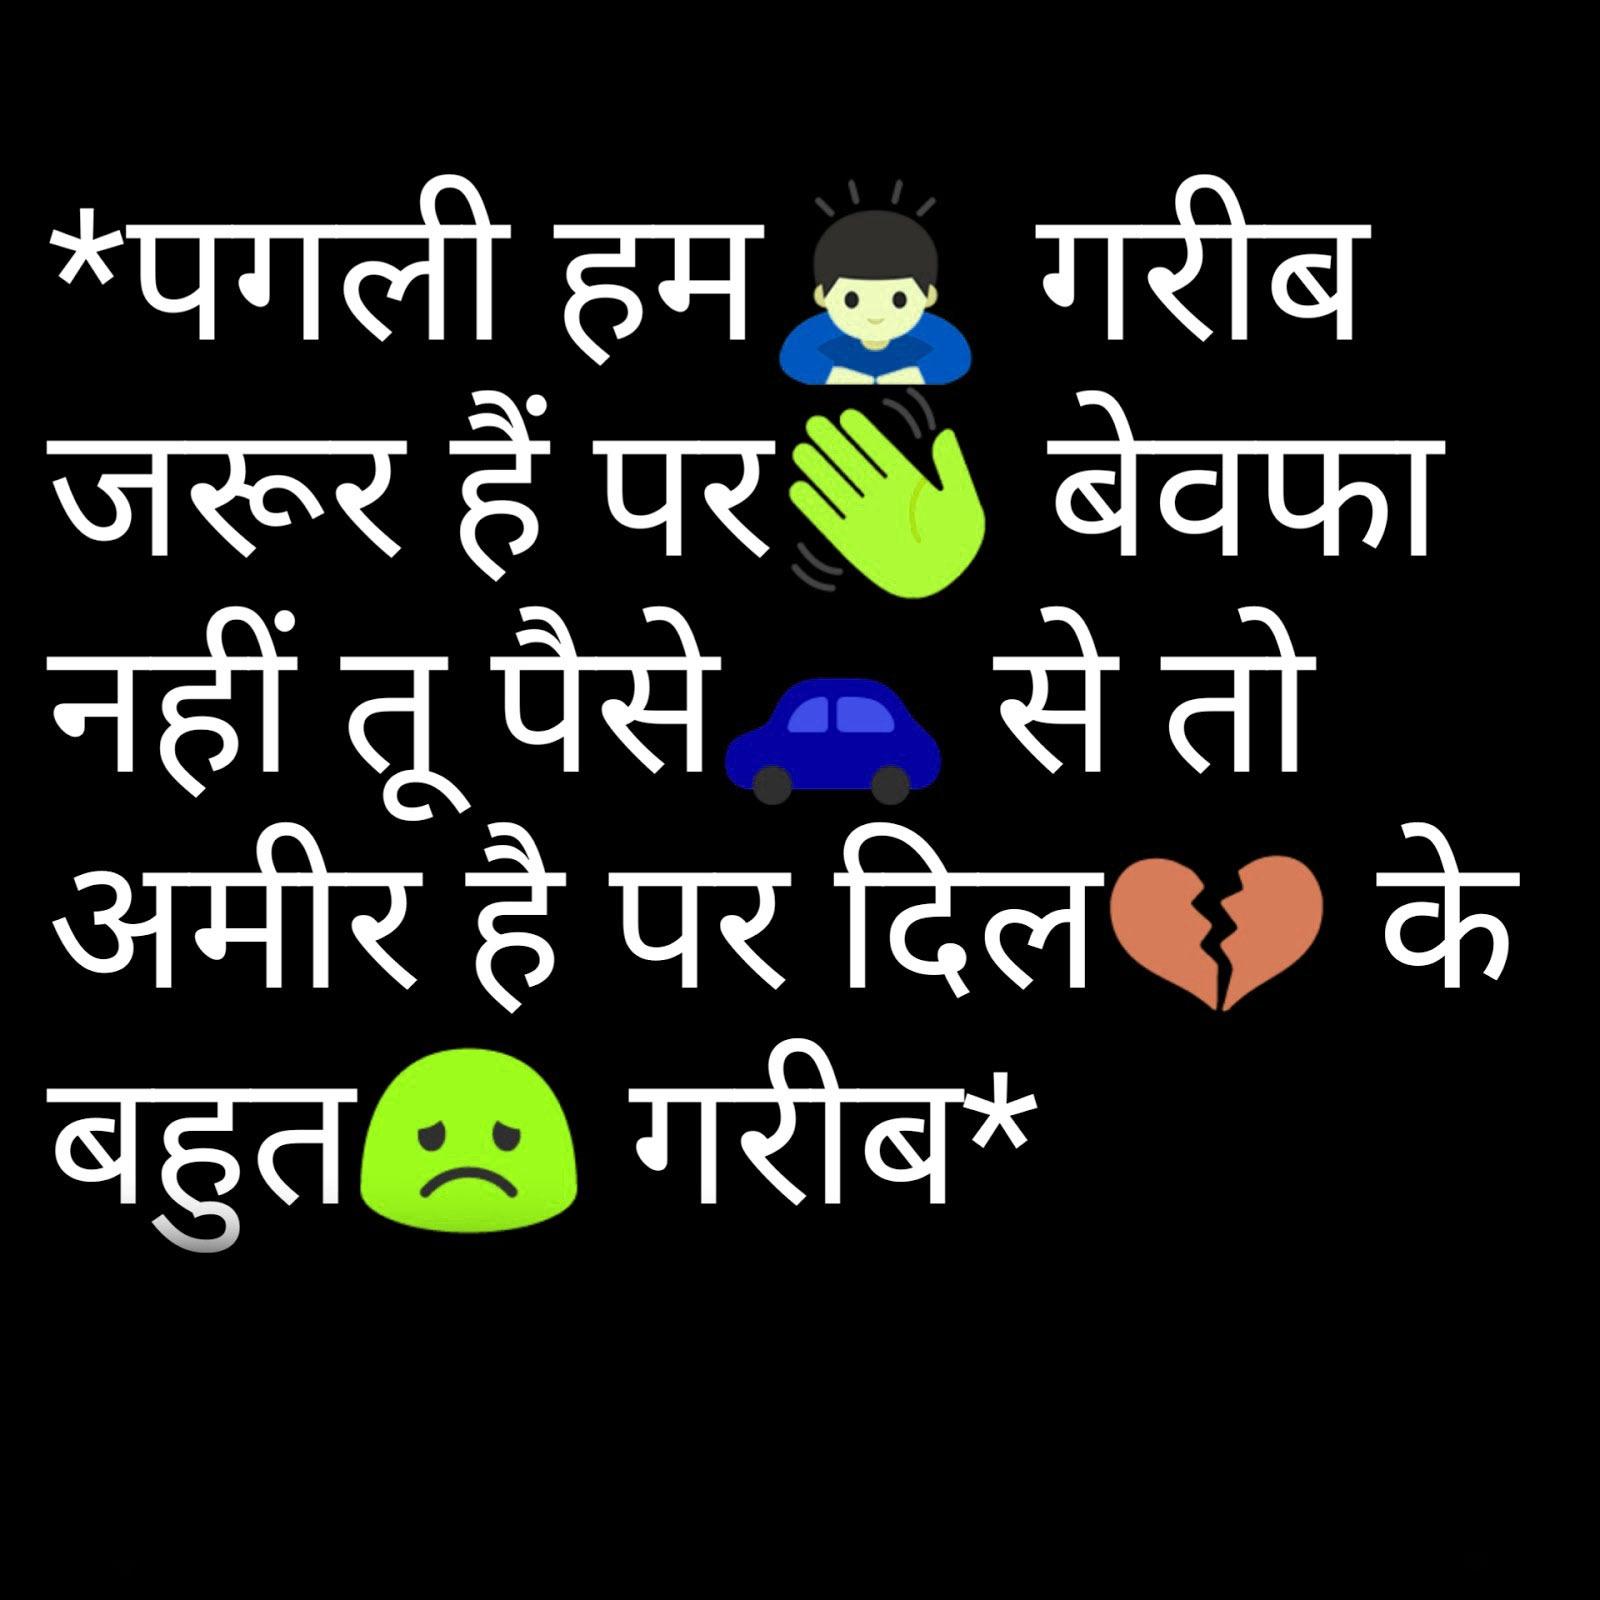 Best Quality Hindi Sad Whatsapp Dp Wallpaper